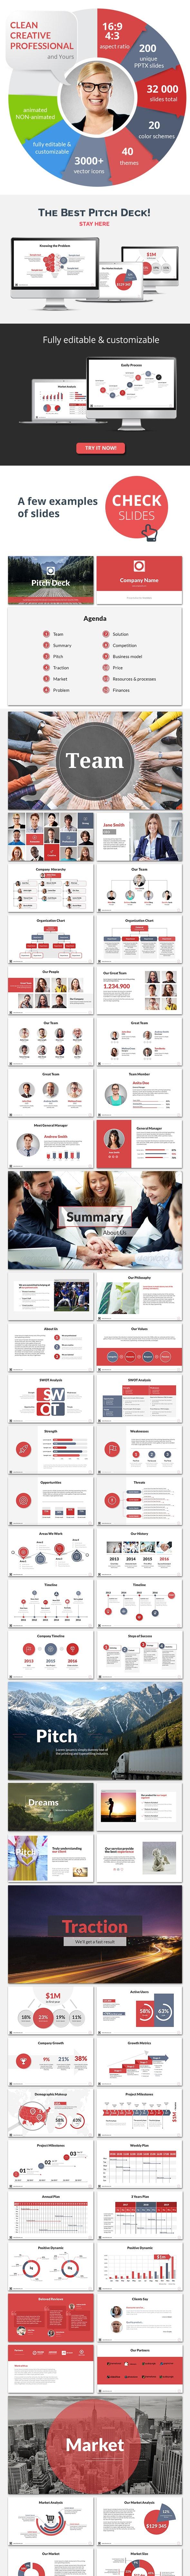 A Pitch Deck PowerPoint Presentation Template - PowerPoint Templates Presentation Templates